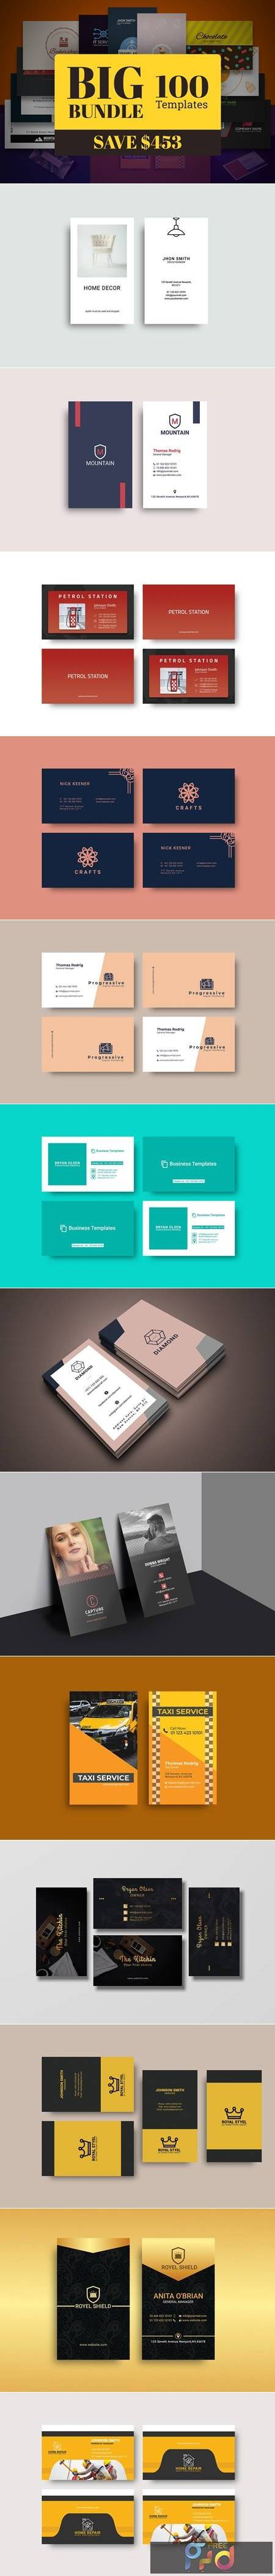 100 Business Card Template Bundle 5910107 1